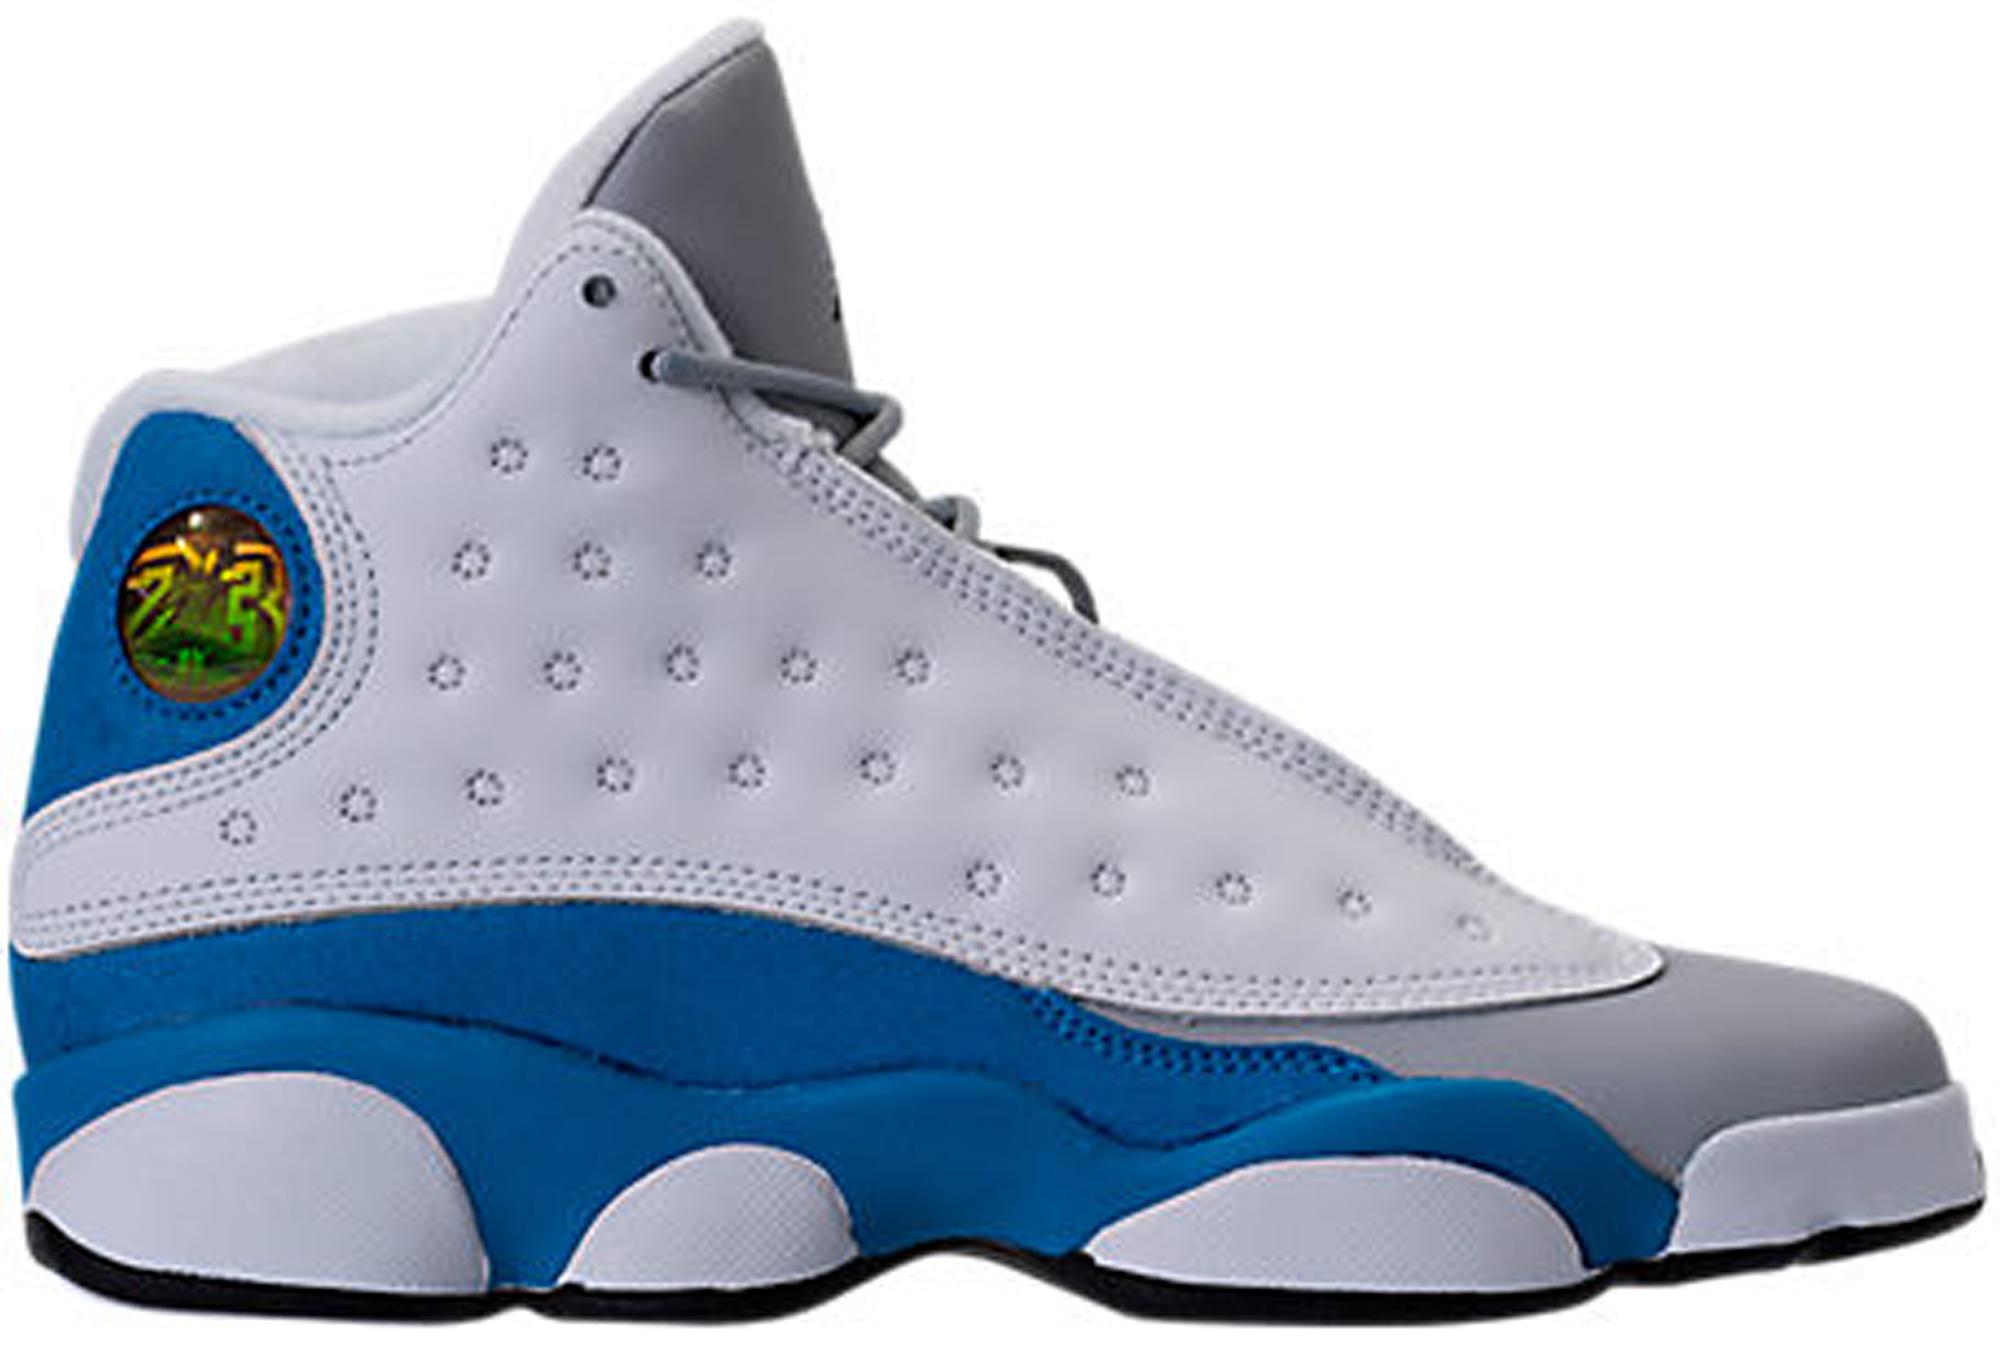 Jordan 13 Retro White Italy Blue (GS